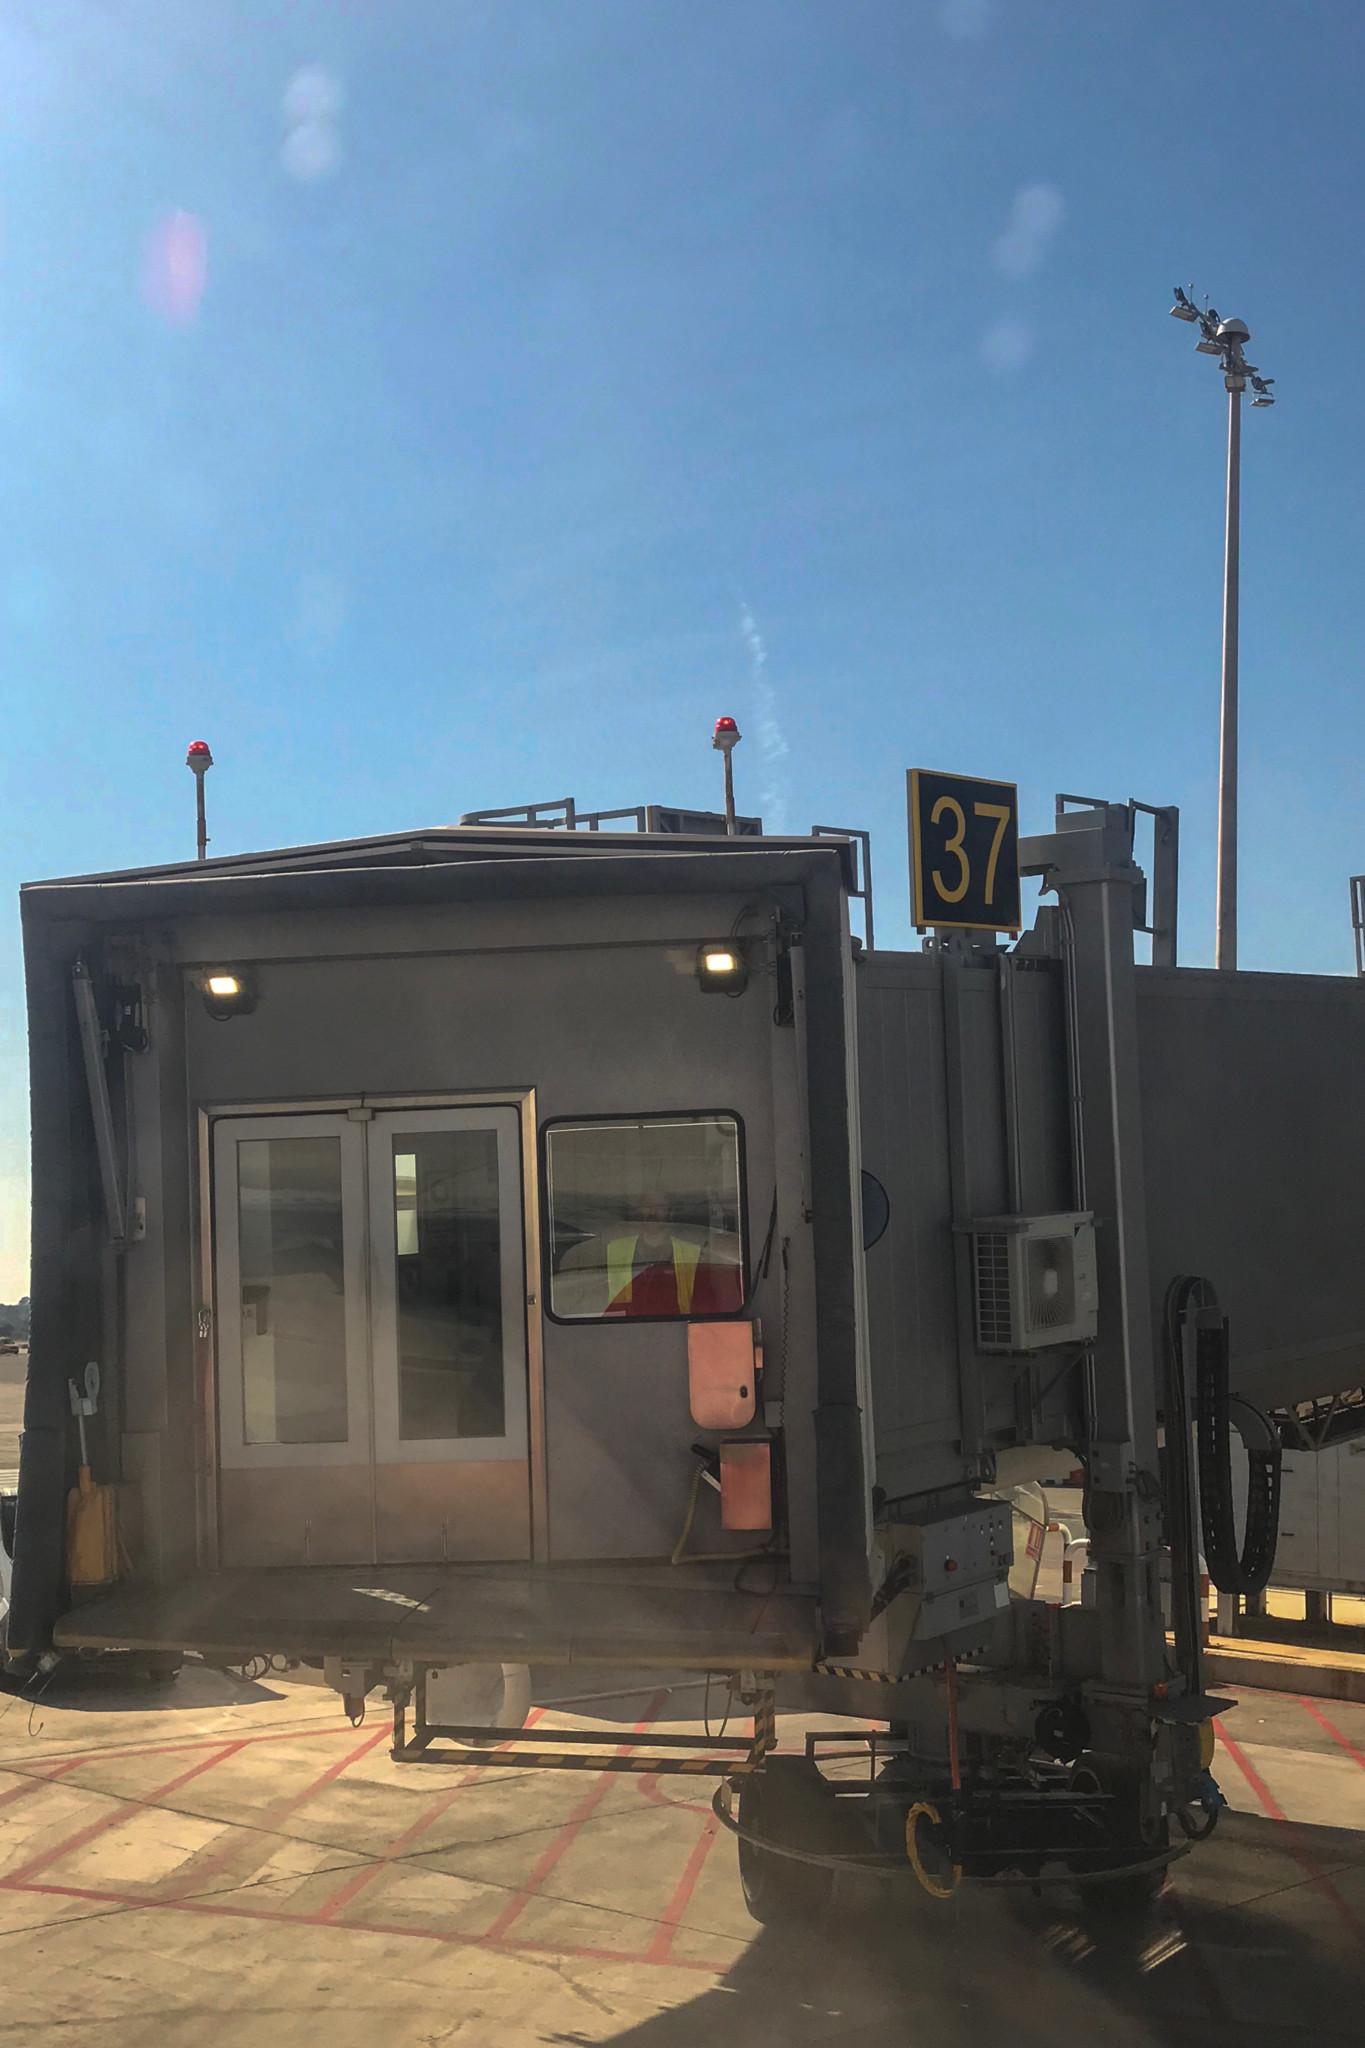 Gangway SAS am Flughafen Stockholm